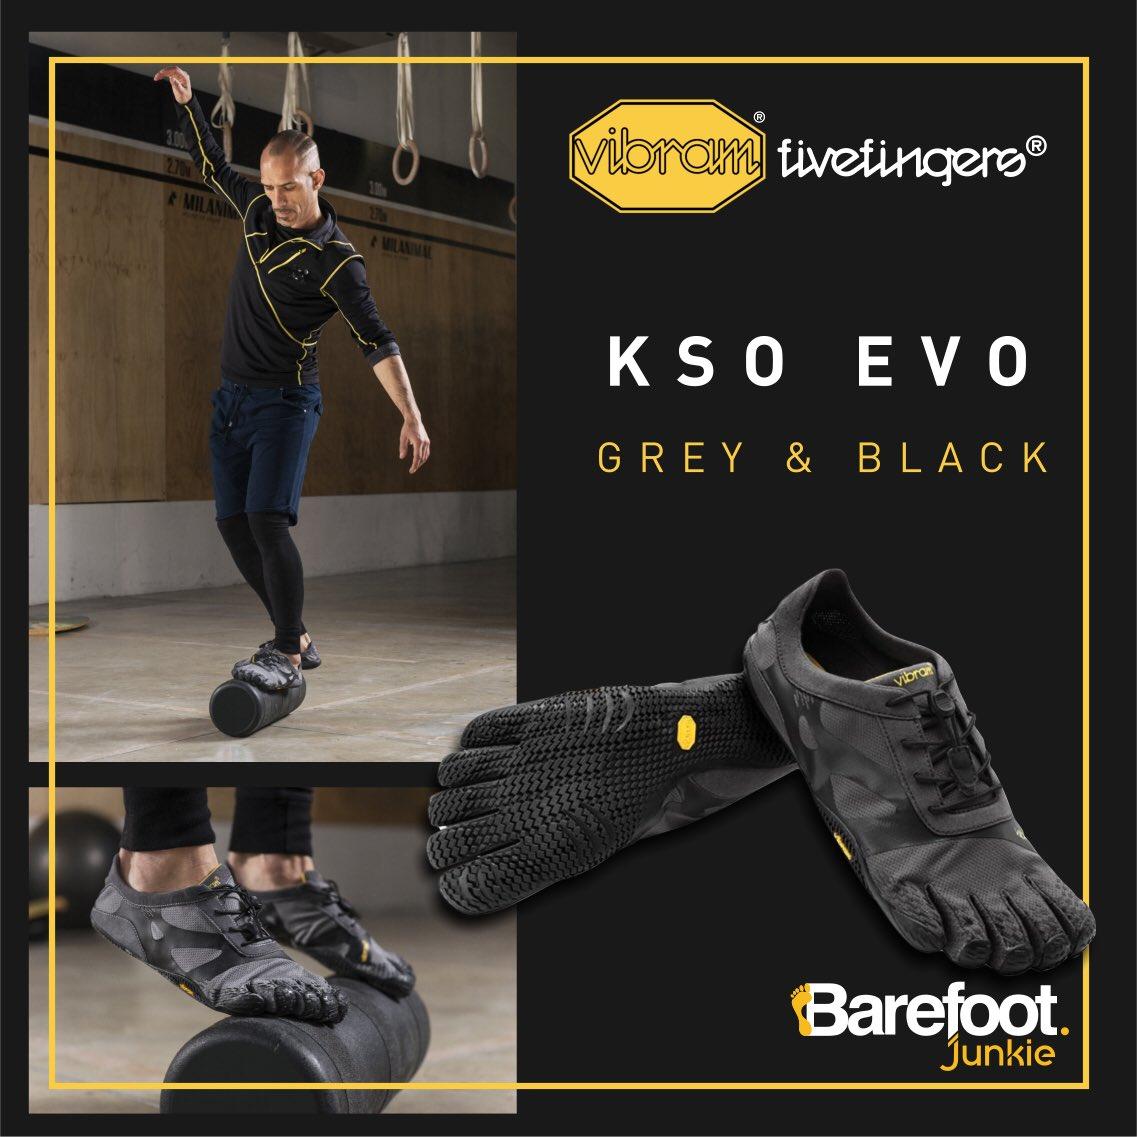 3acc52b577d0  VibramFivefingers KSO EVO Grey   Black from Barefoot Junkie https   www.